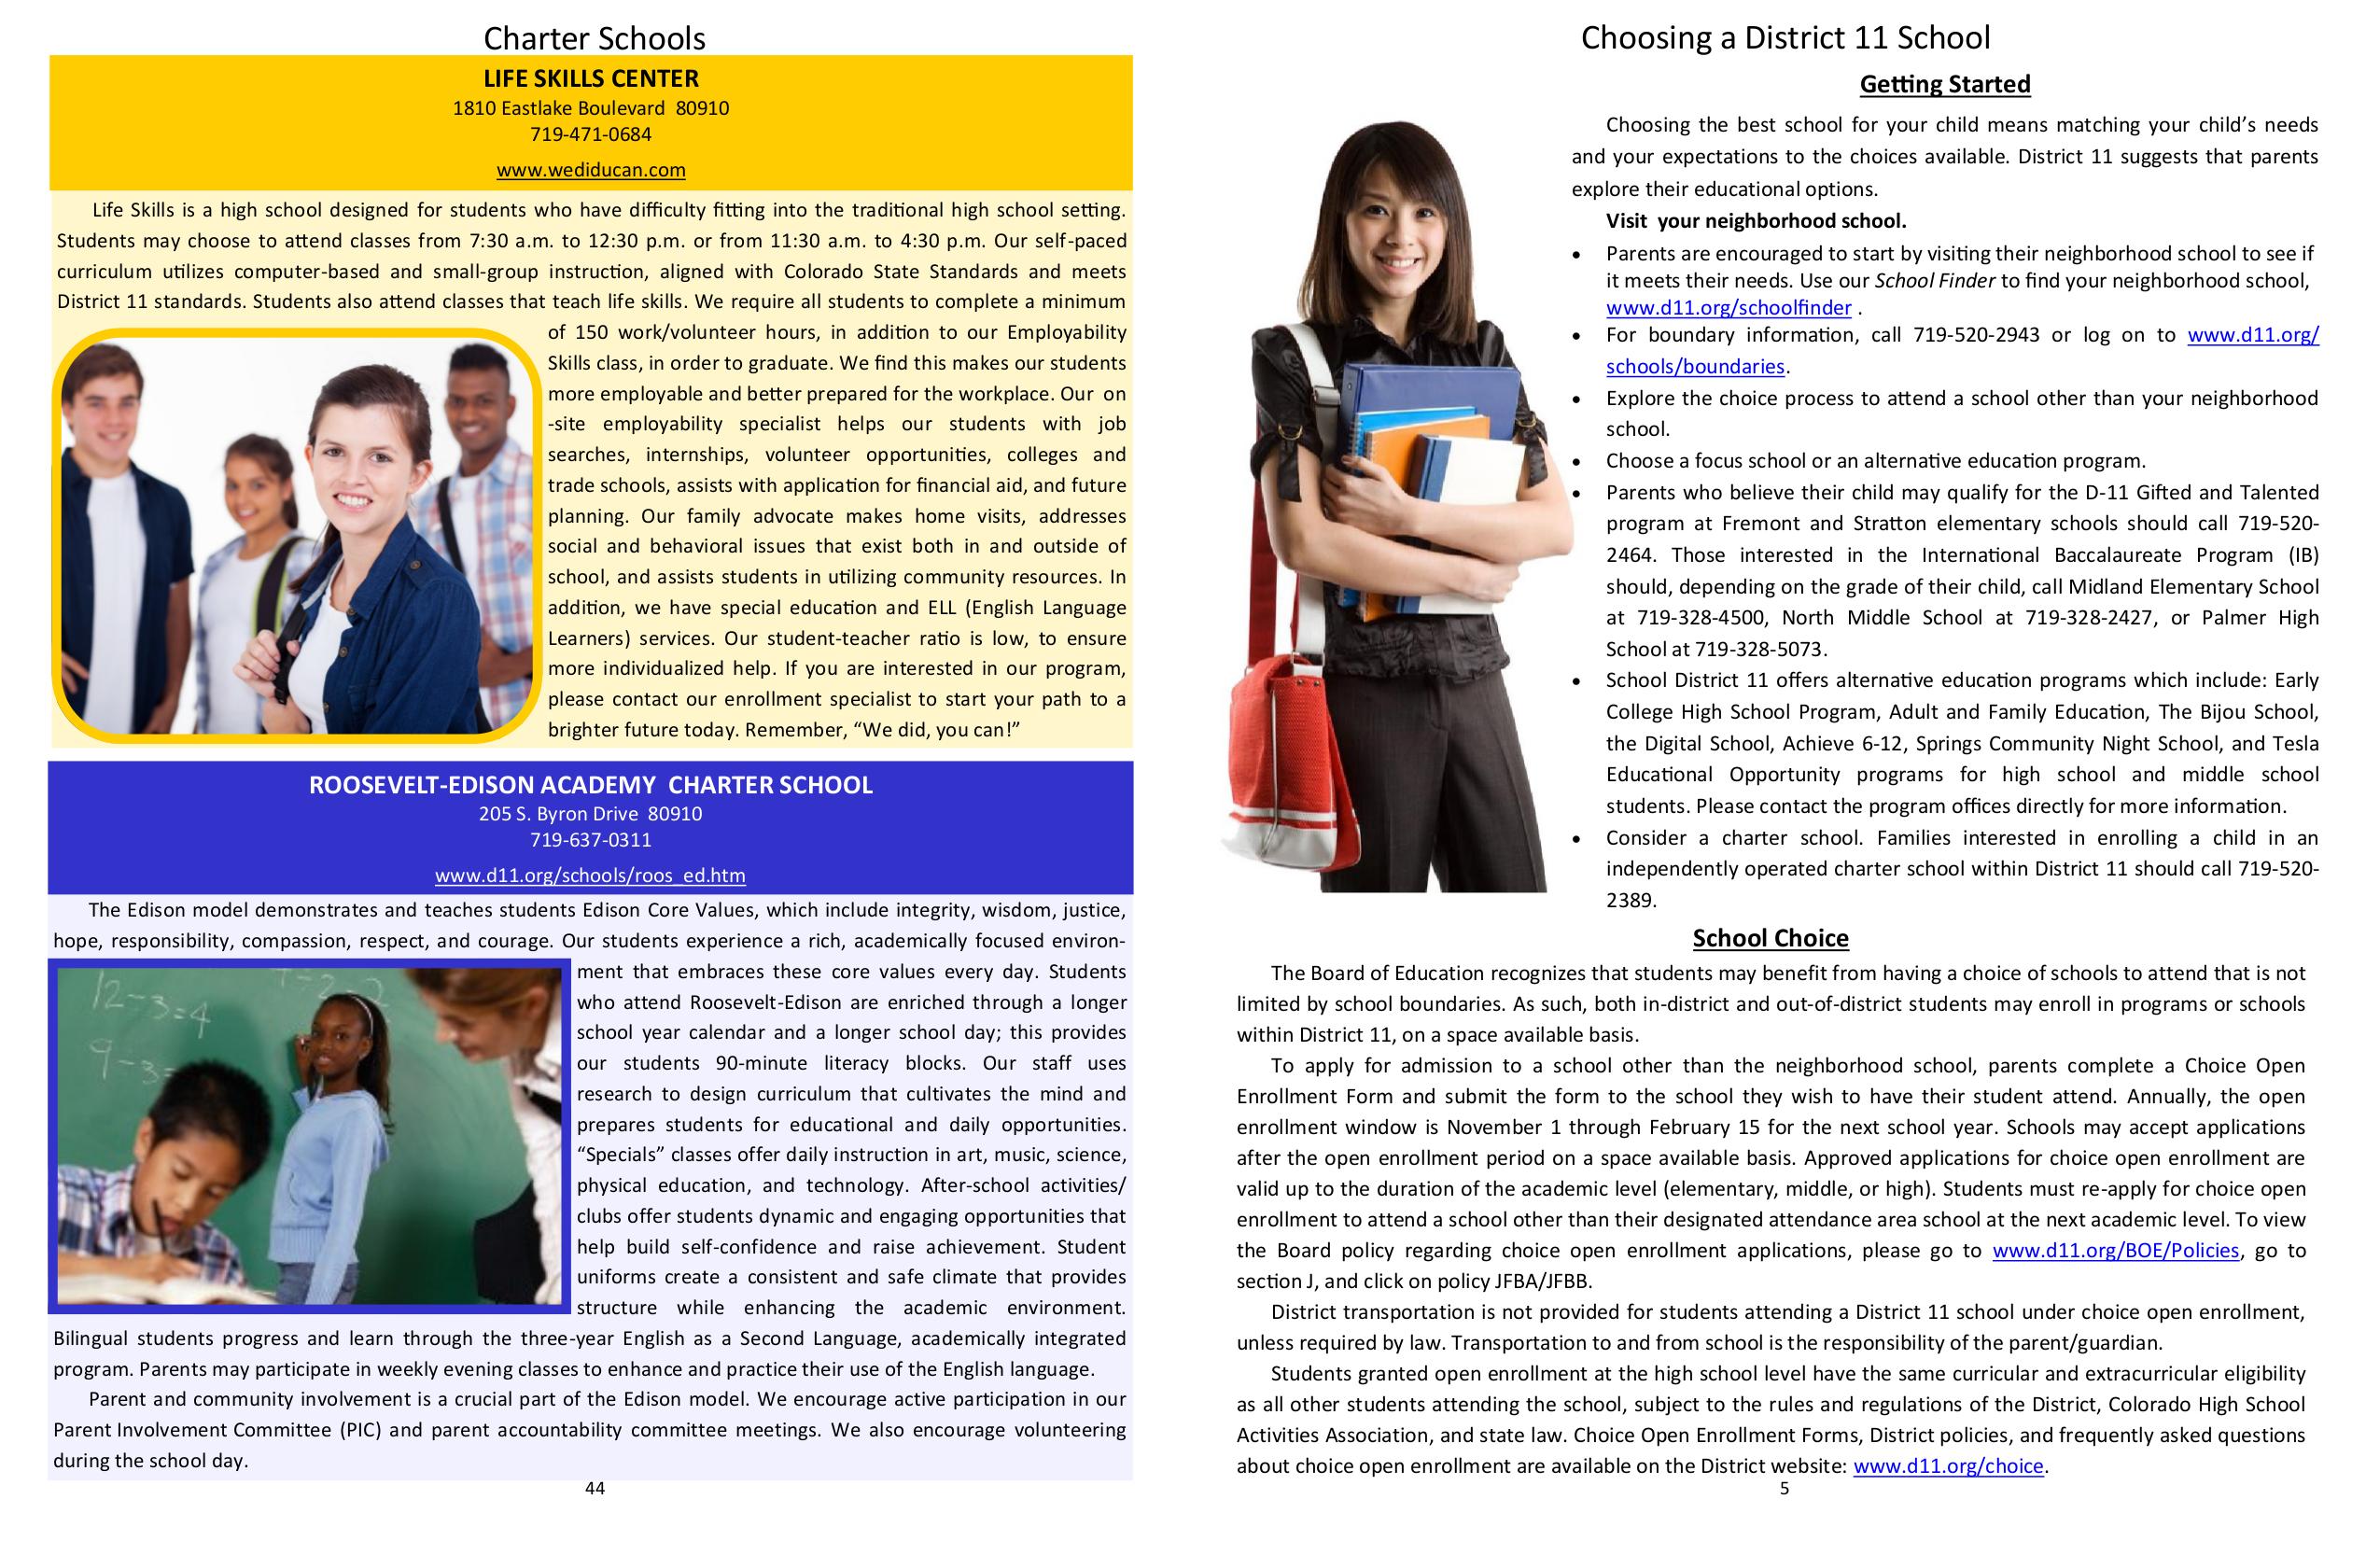 pdf manual for sima digital camera dv 6400 rh umlib com Sony Digital Camera Manual Omni 2 Digital Camera Manual